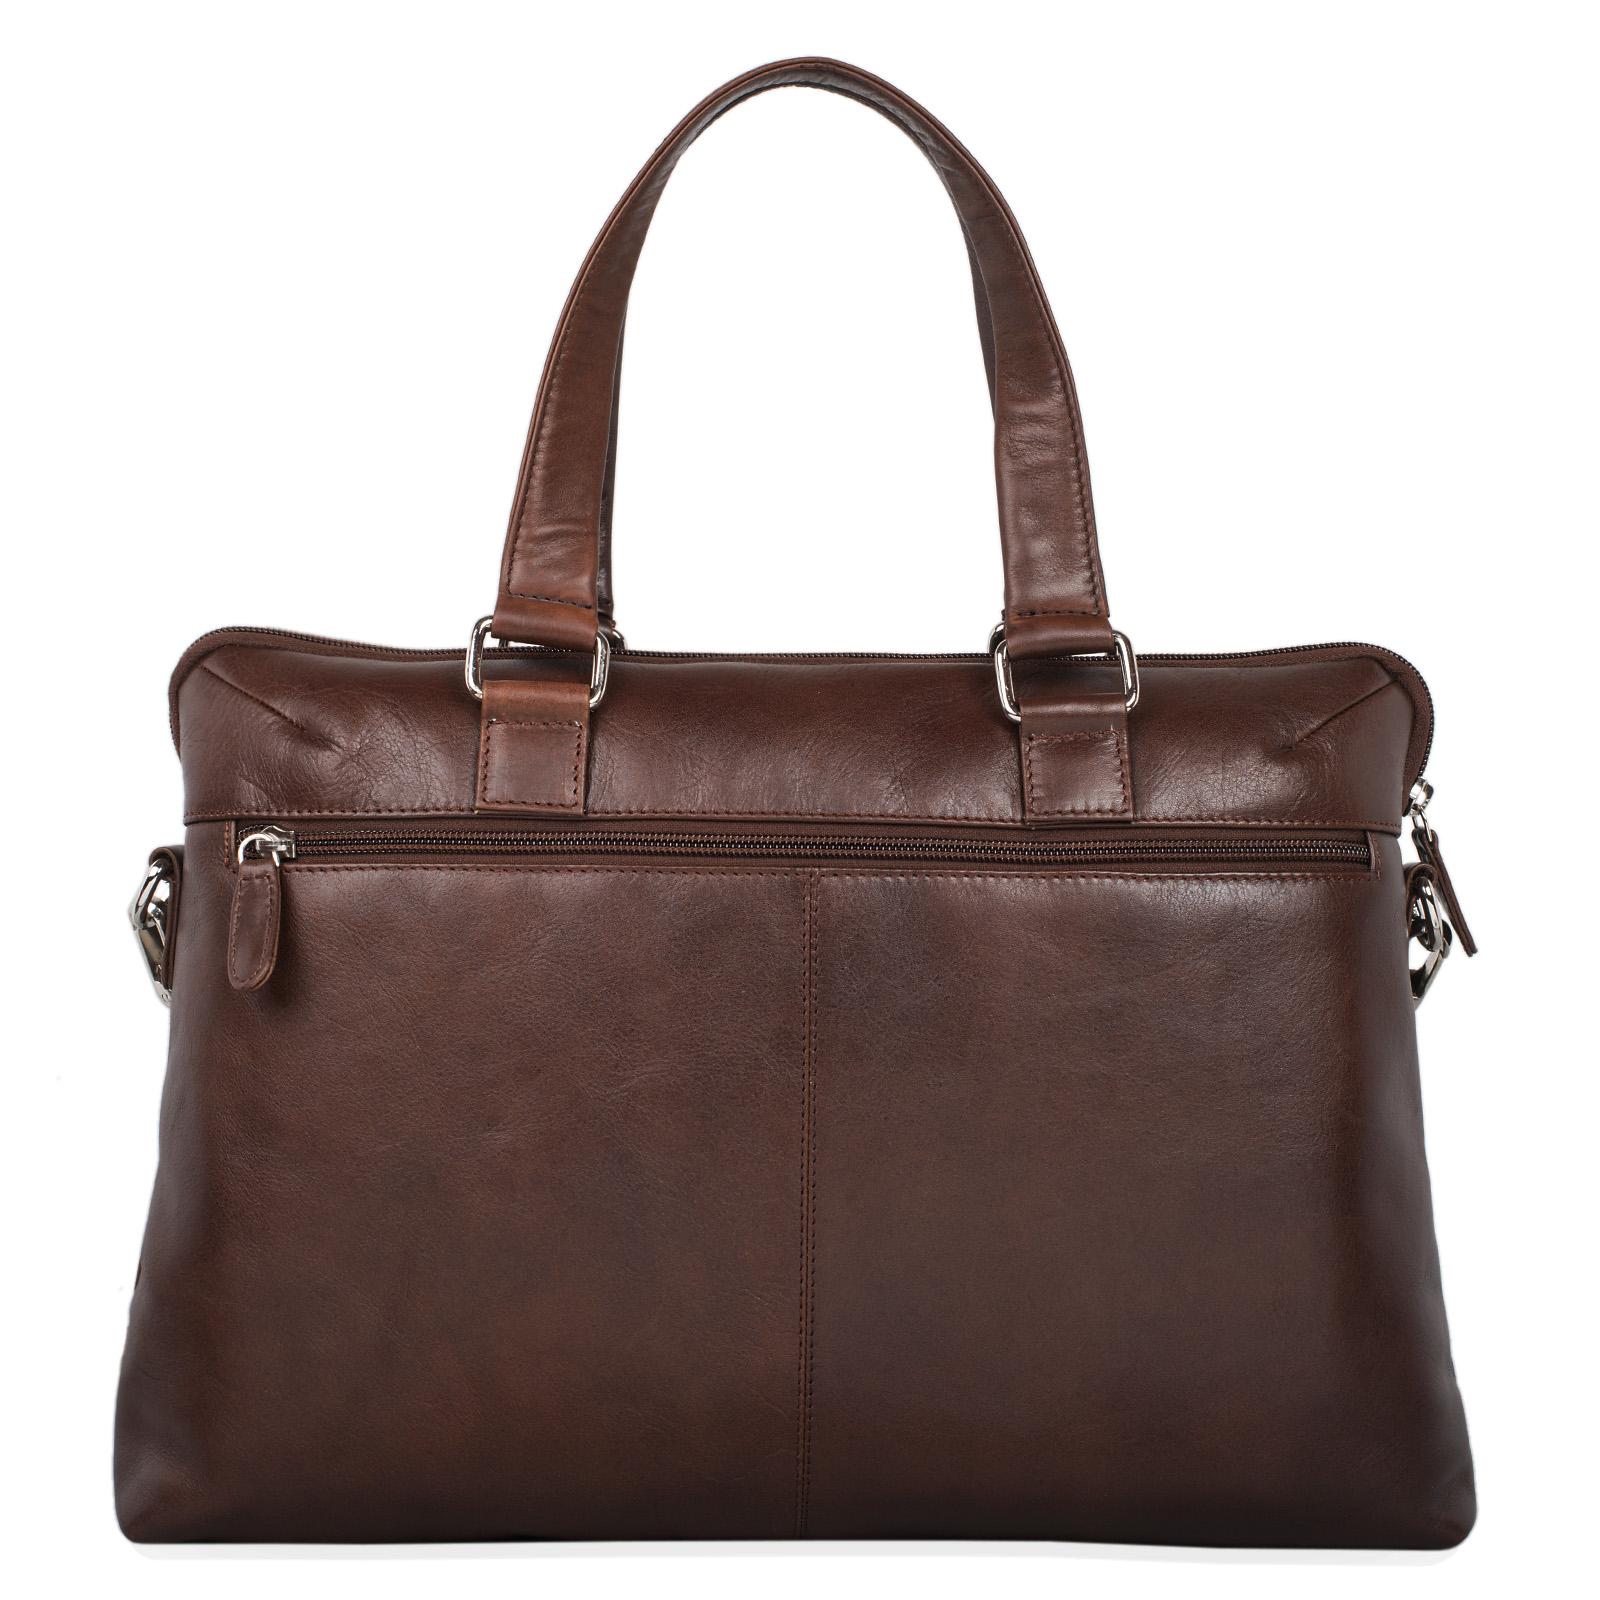 Repräsentative Business Bag Büro Leder schwarz